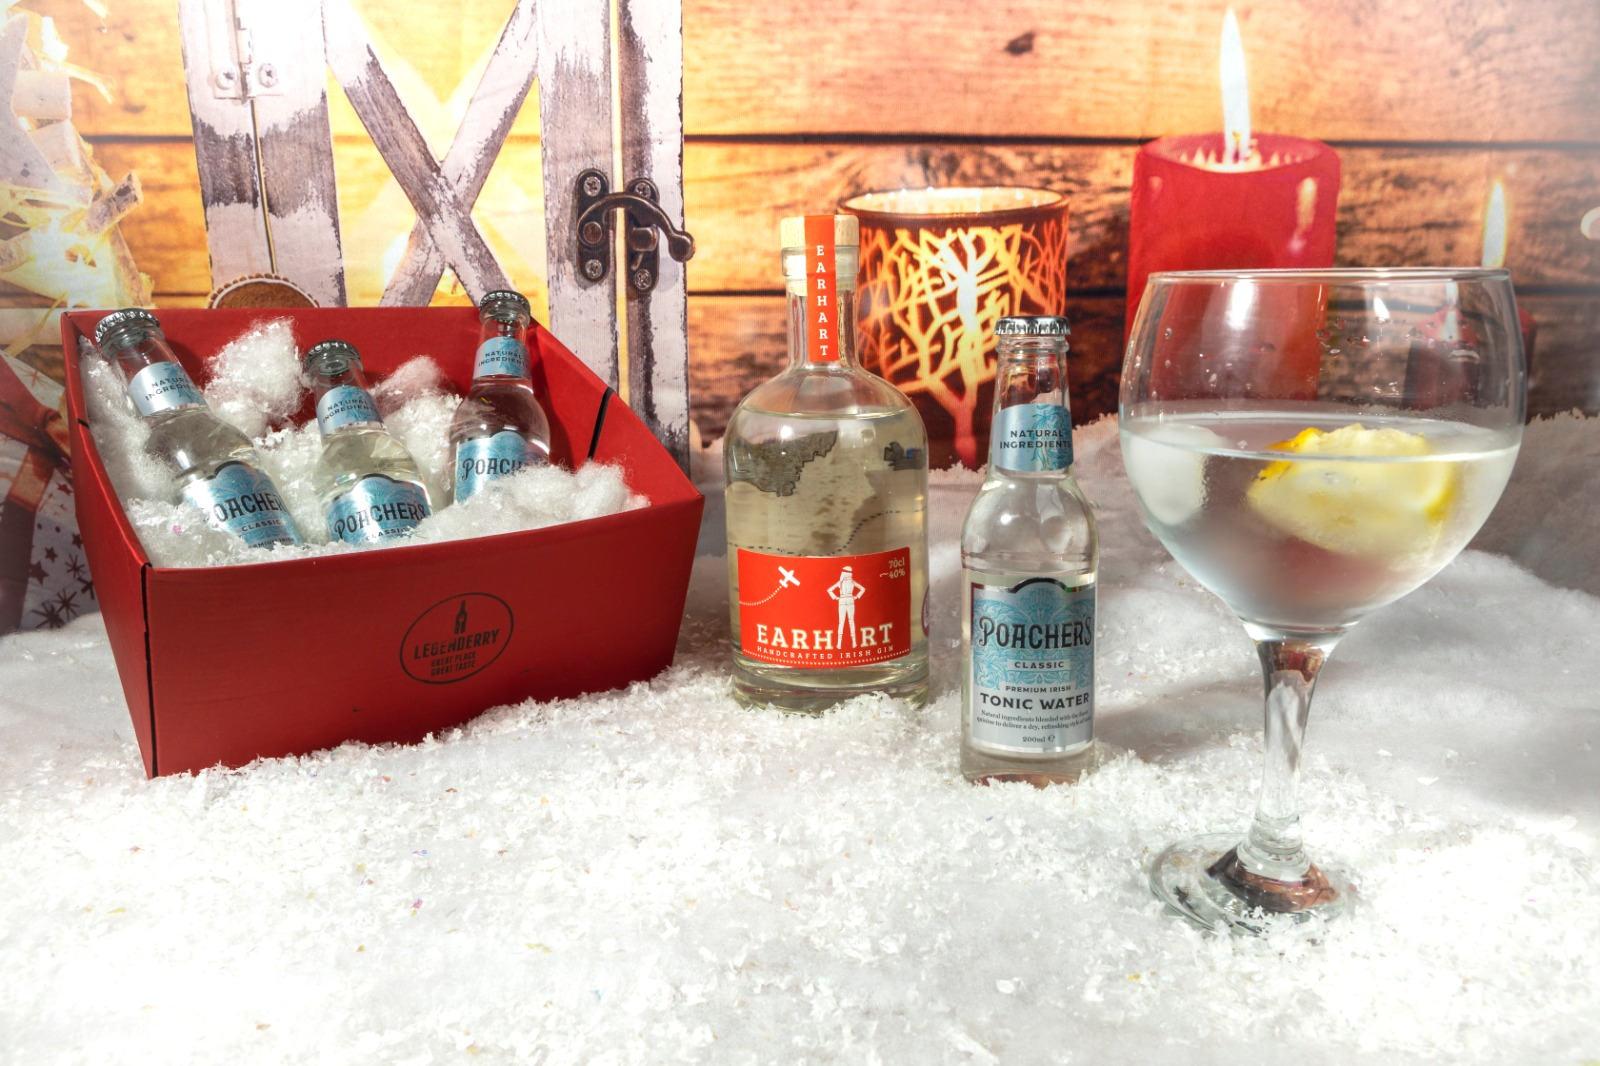 Earhart Gin